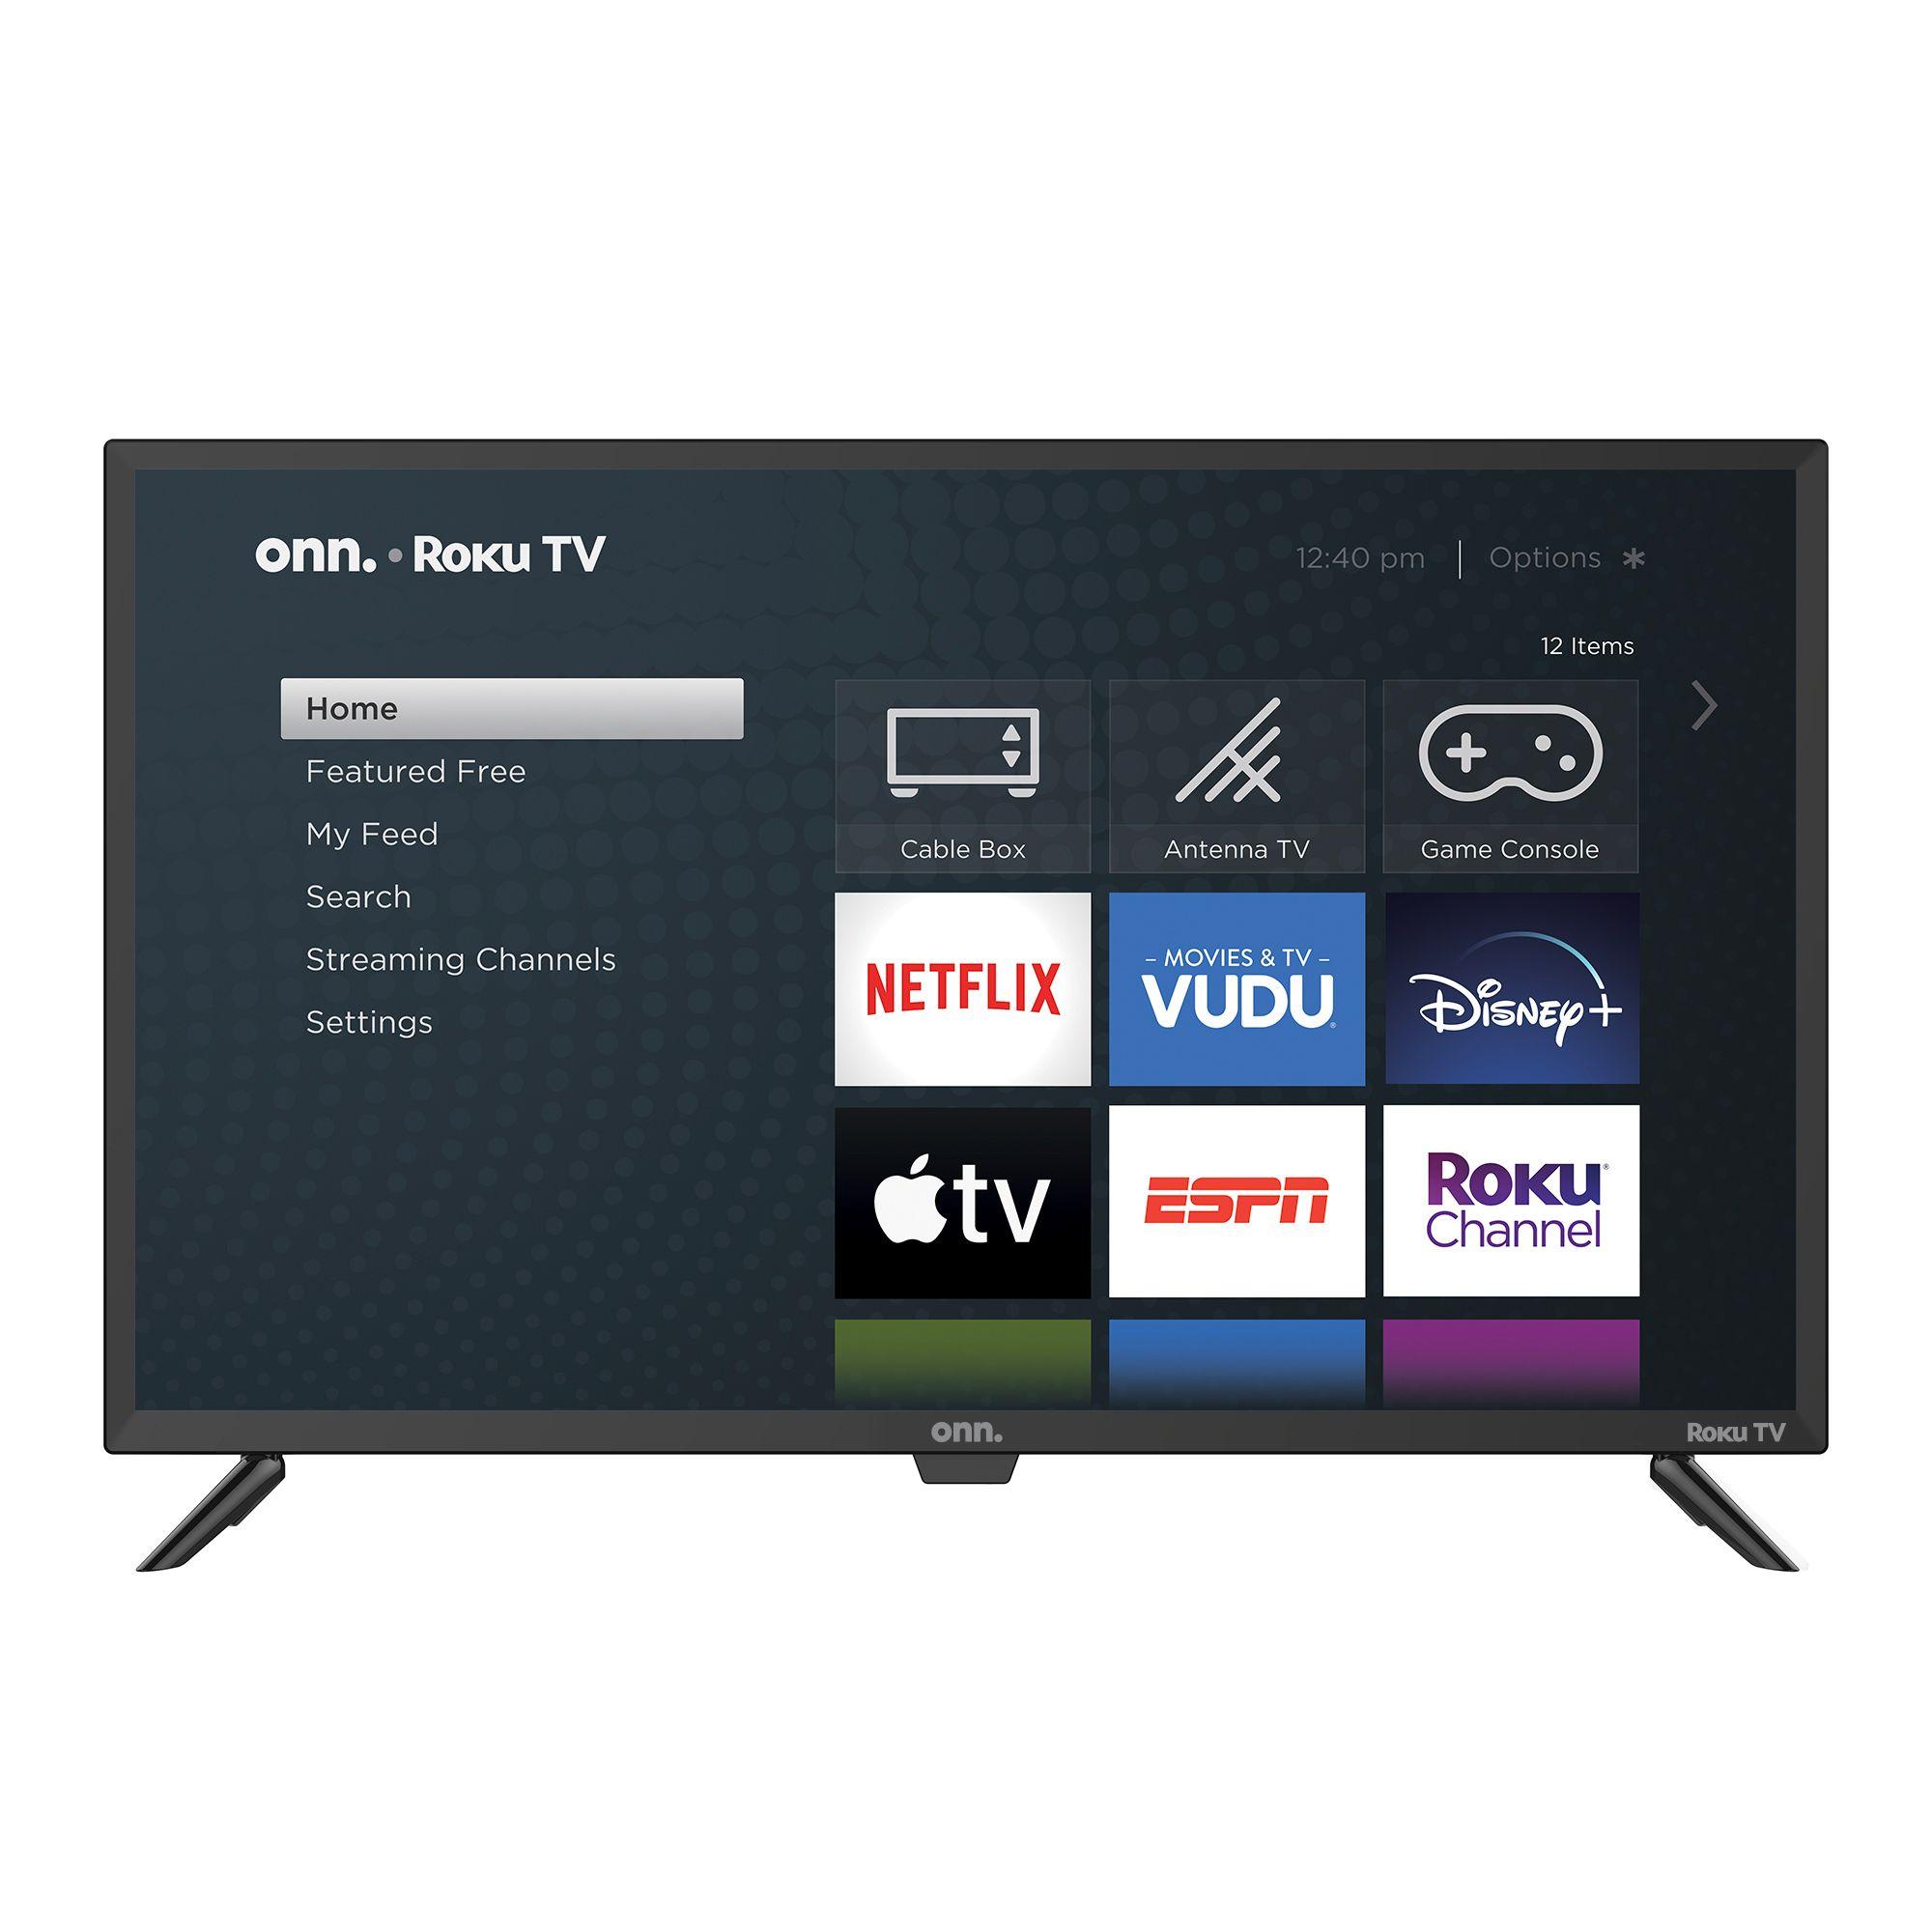 Onn 32 Class Hd 720p Led Roku Smart Tv 100012589 Walmart Com In 2020 Led Tv Smart Tv Roku